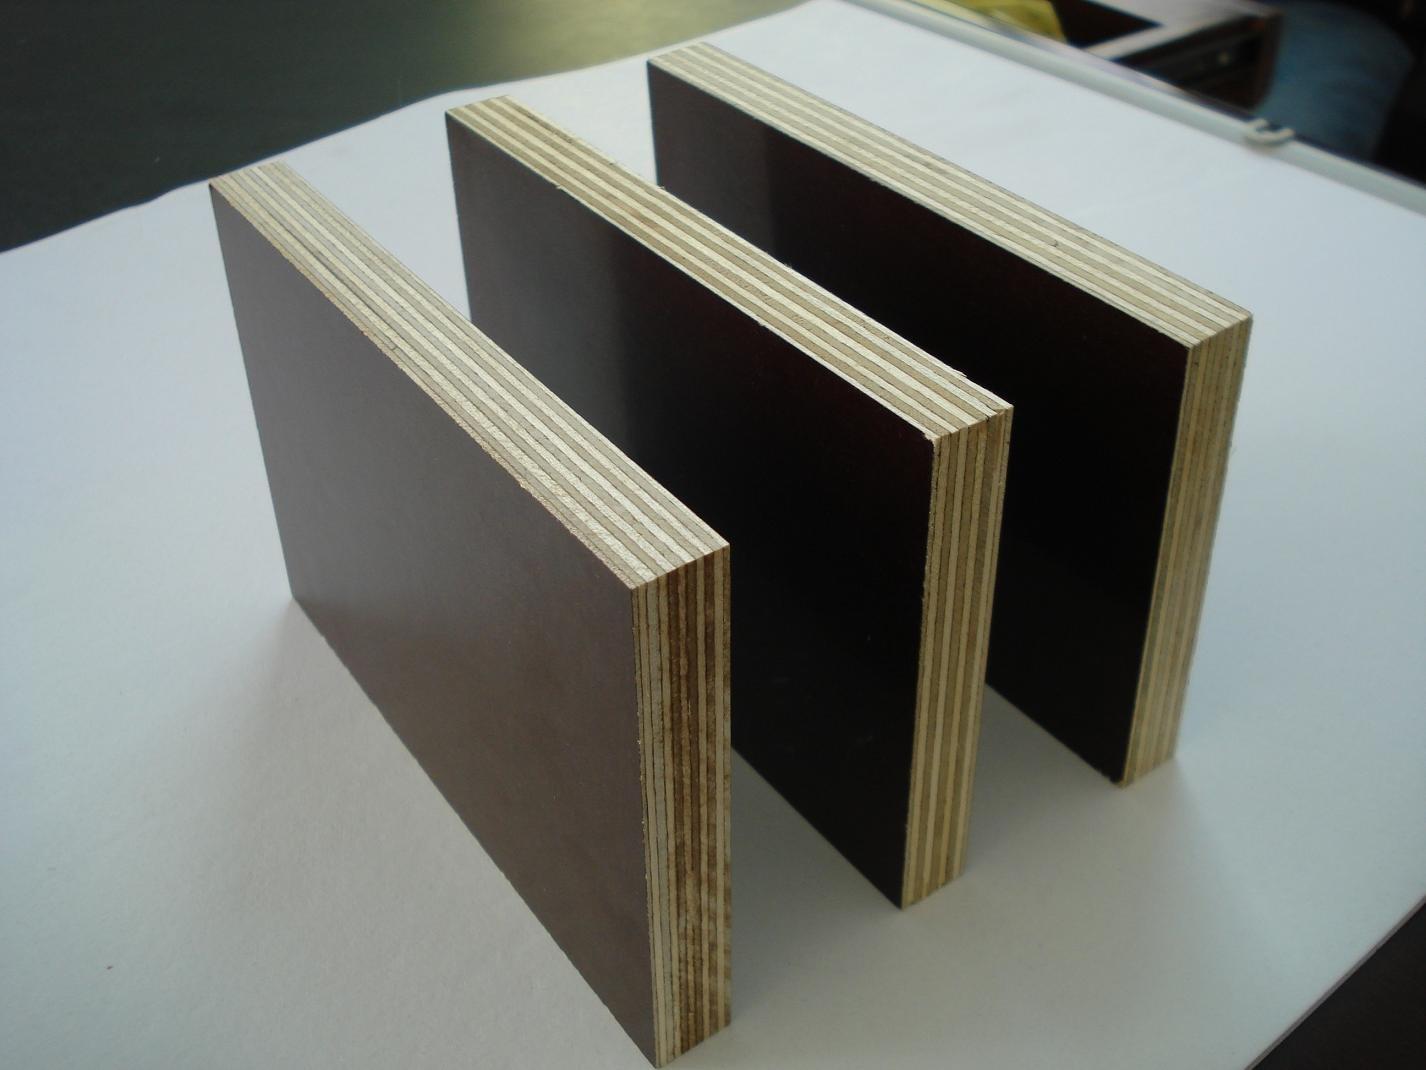 Phenolic Boards Market